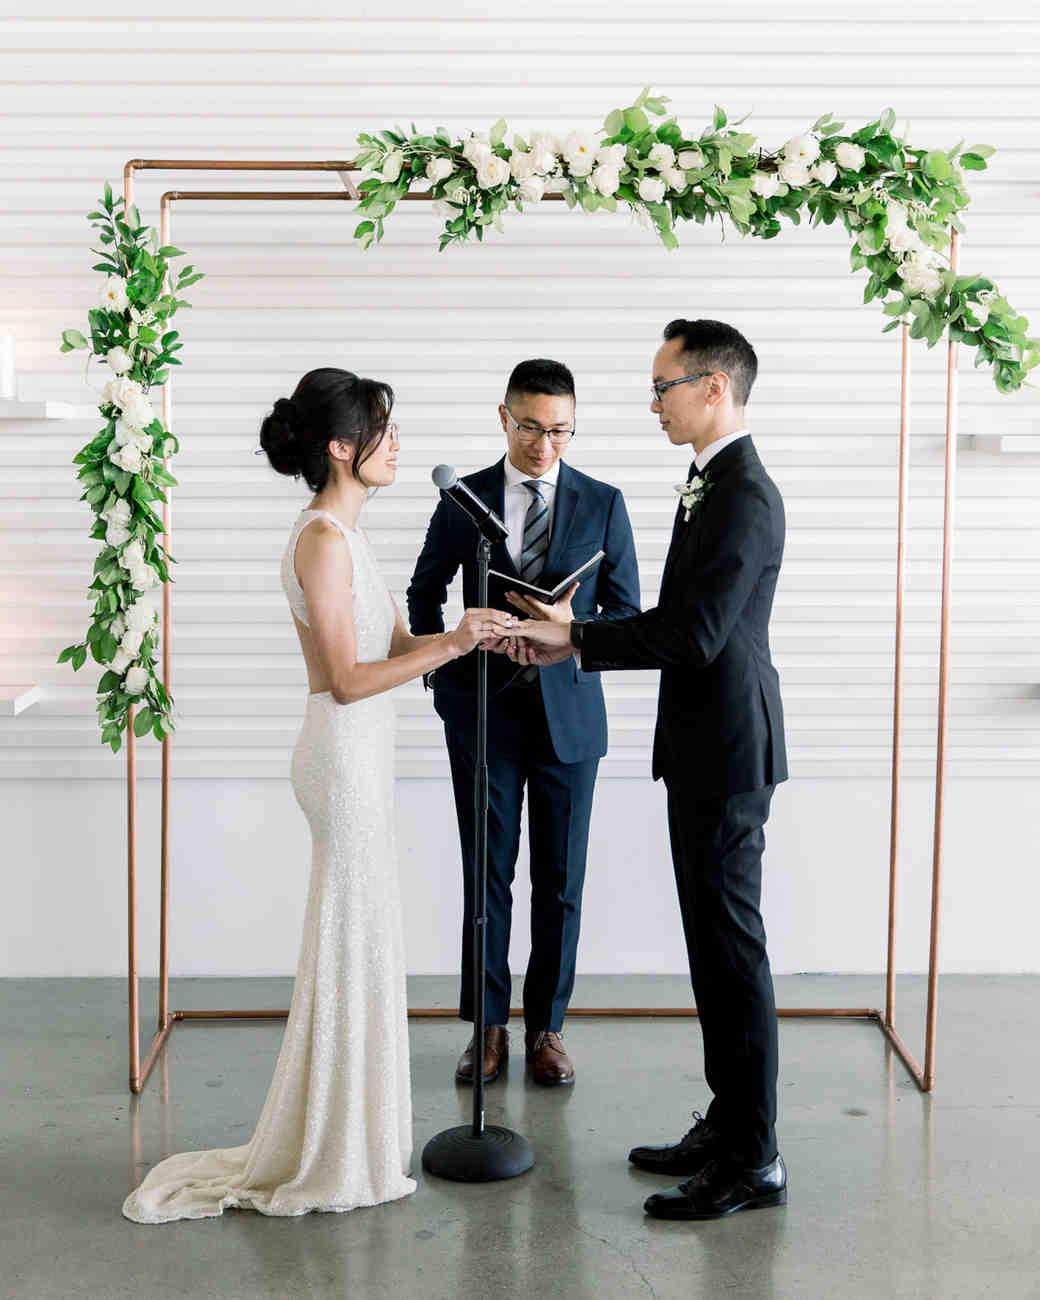 wedding ceremony bride and groom under white rose display